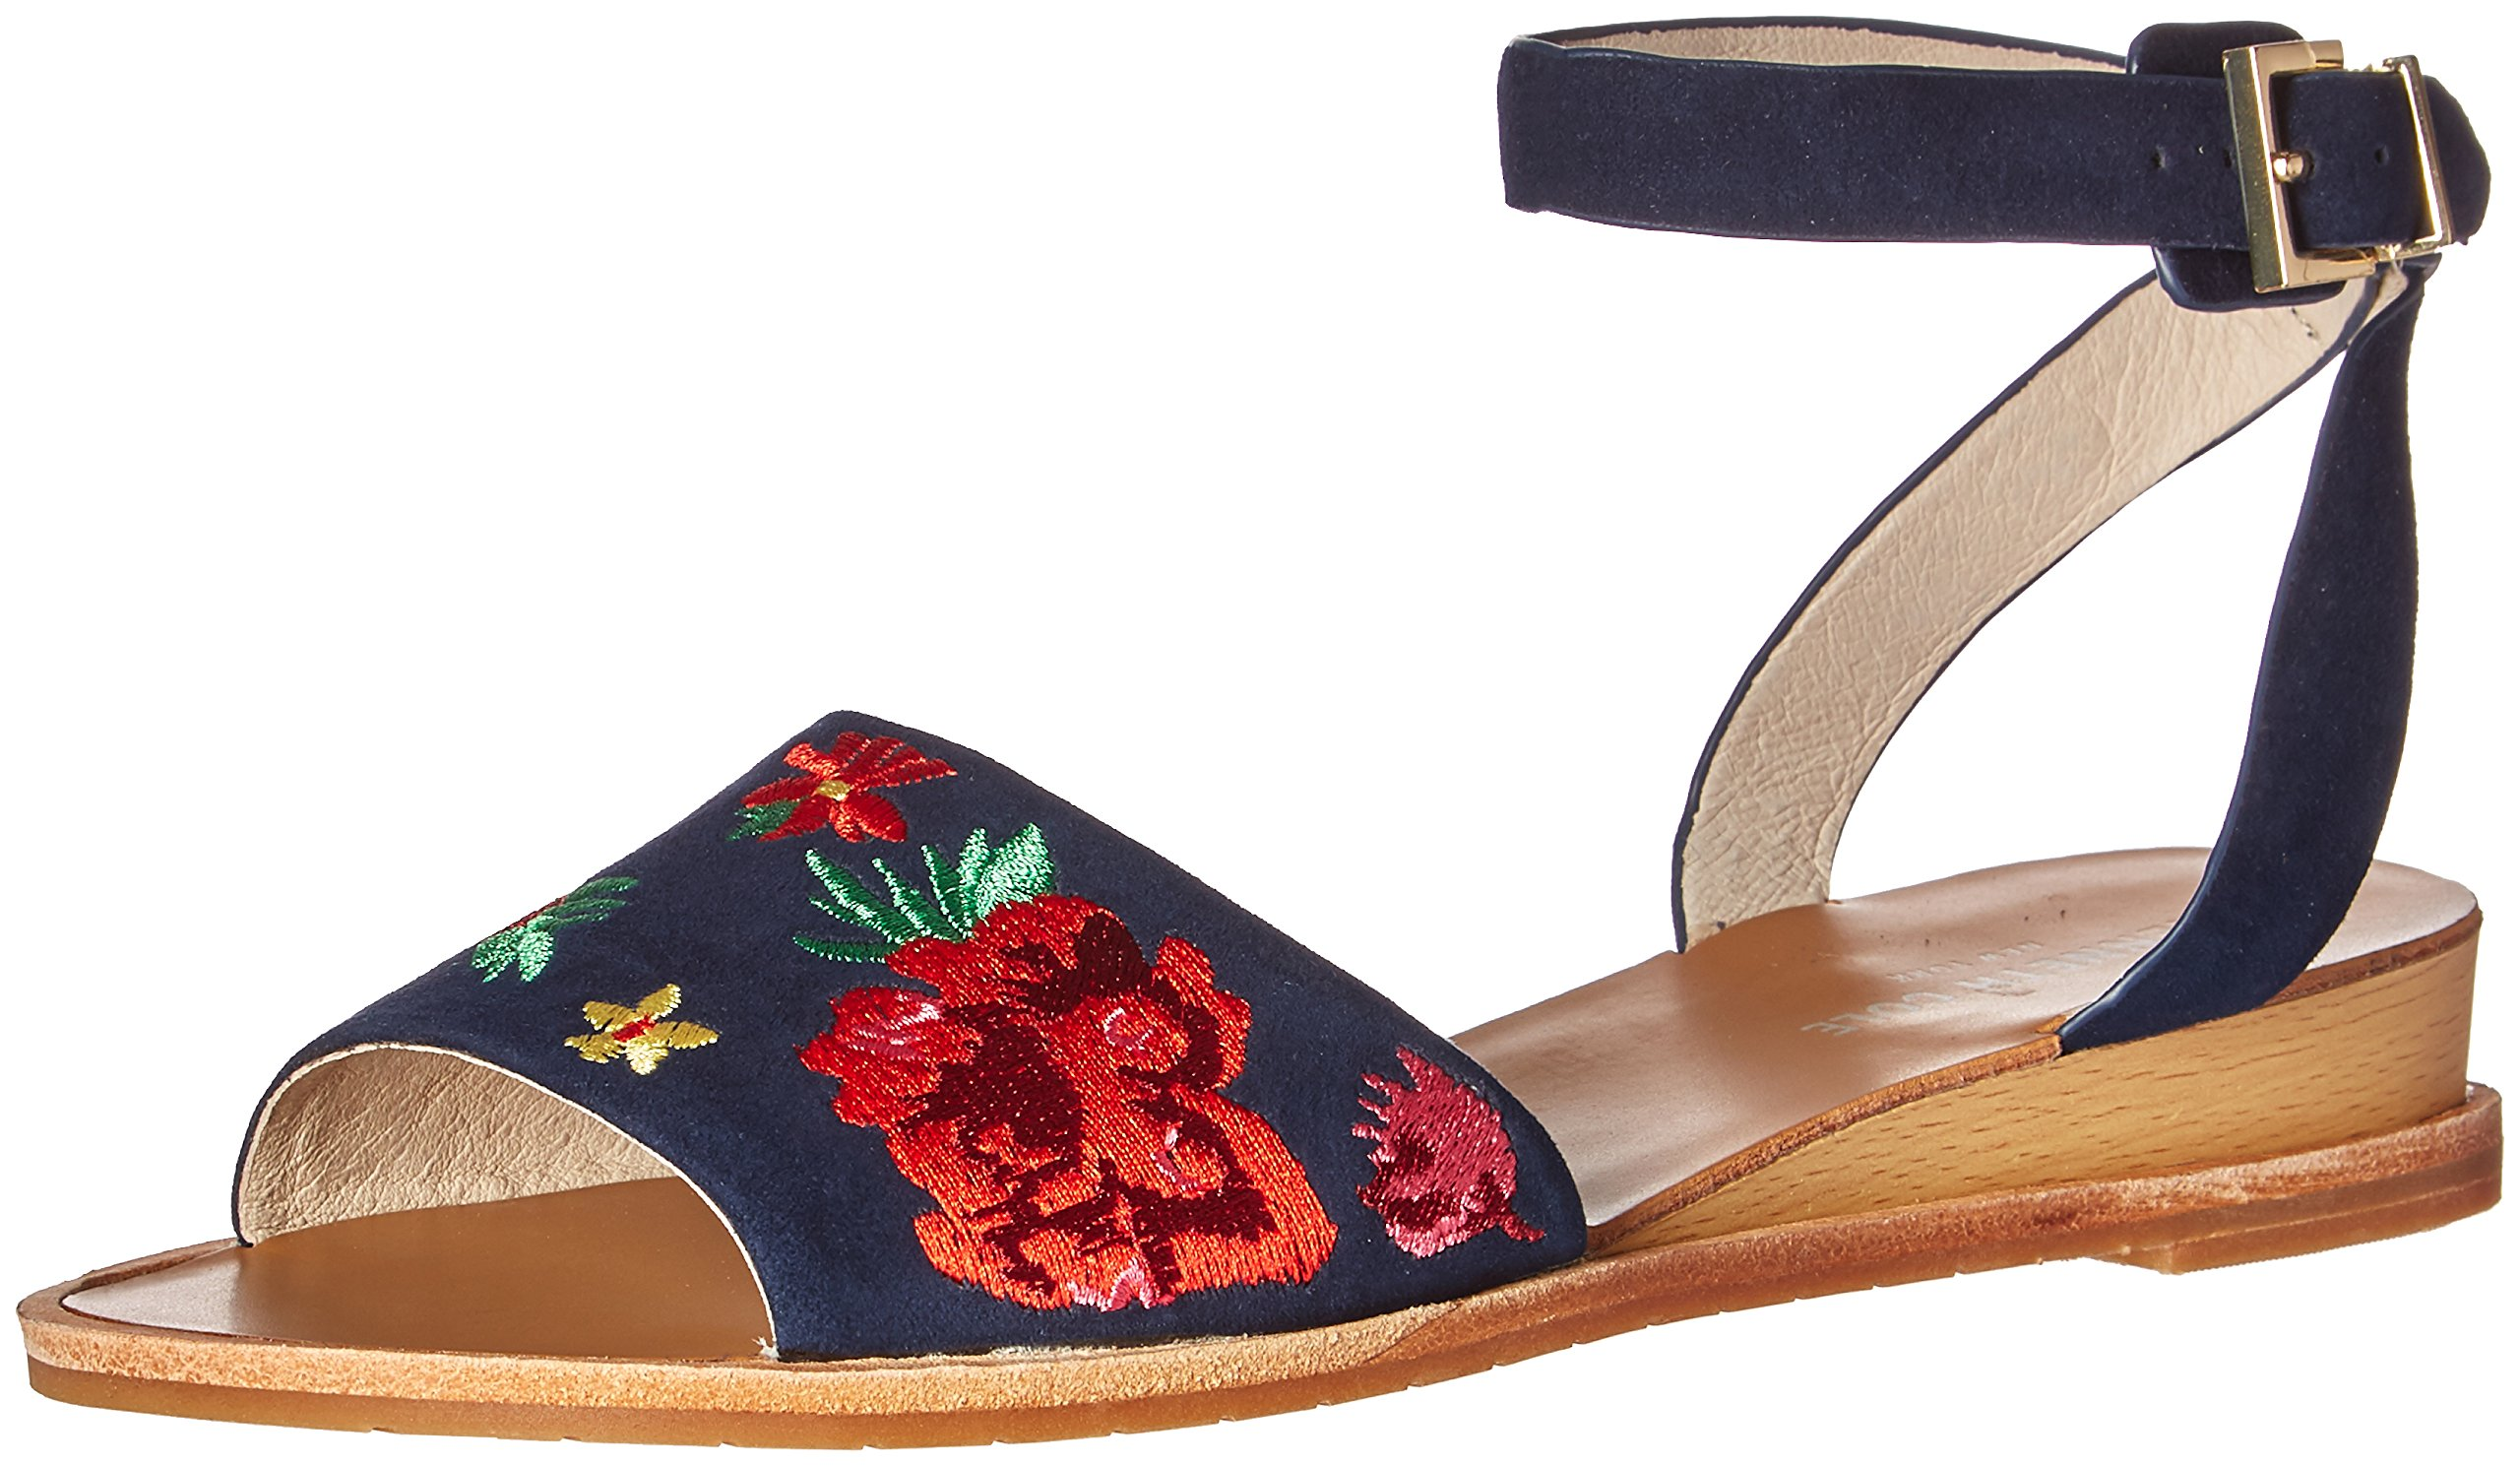 Kenneth Cole New York Women's Jory 3 Dress Sandal, Marine, 7 M US